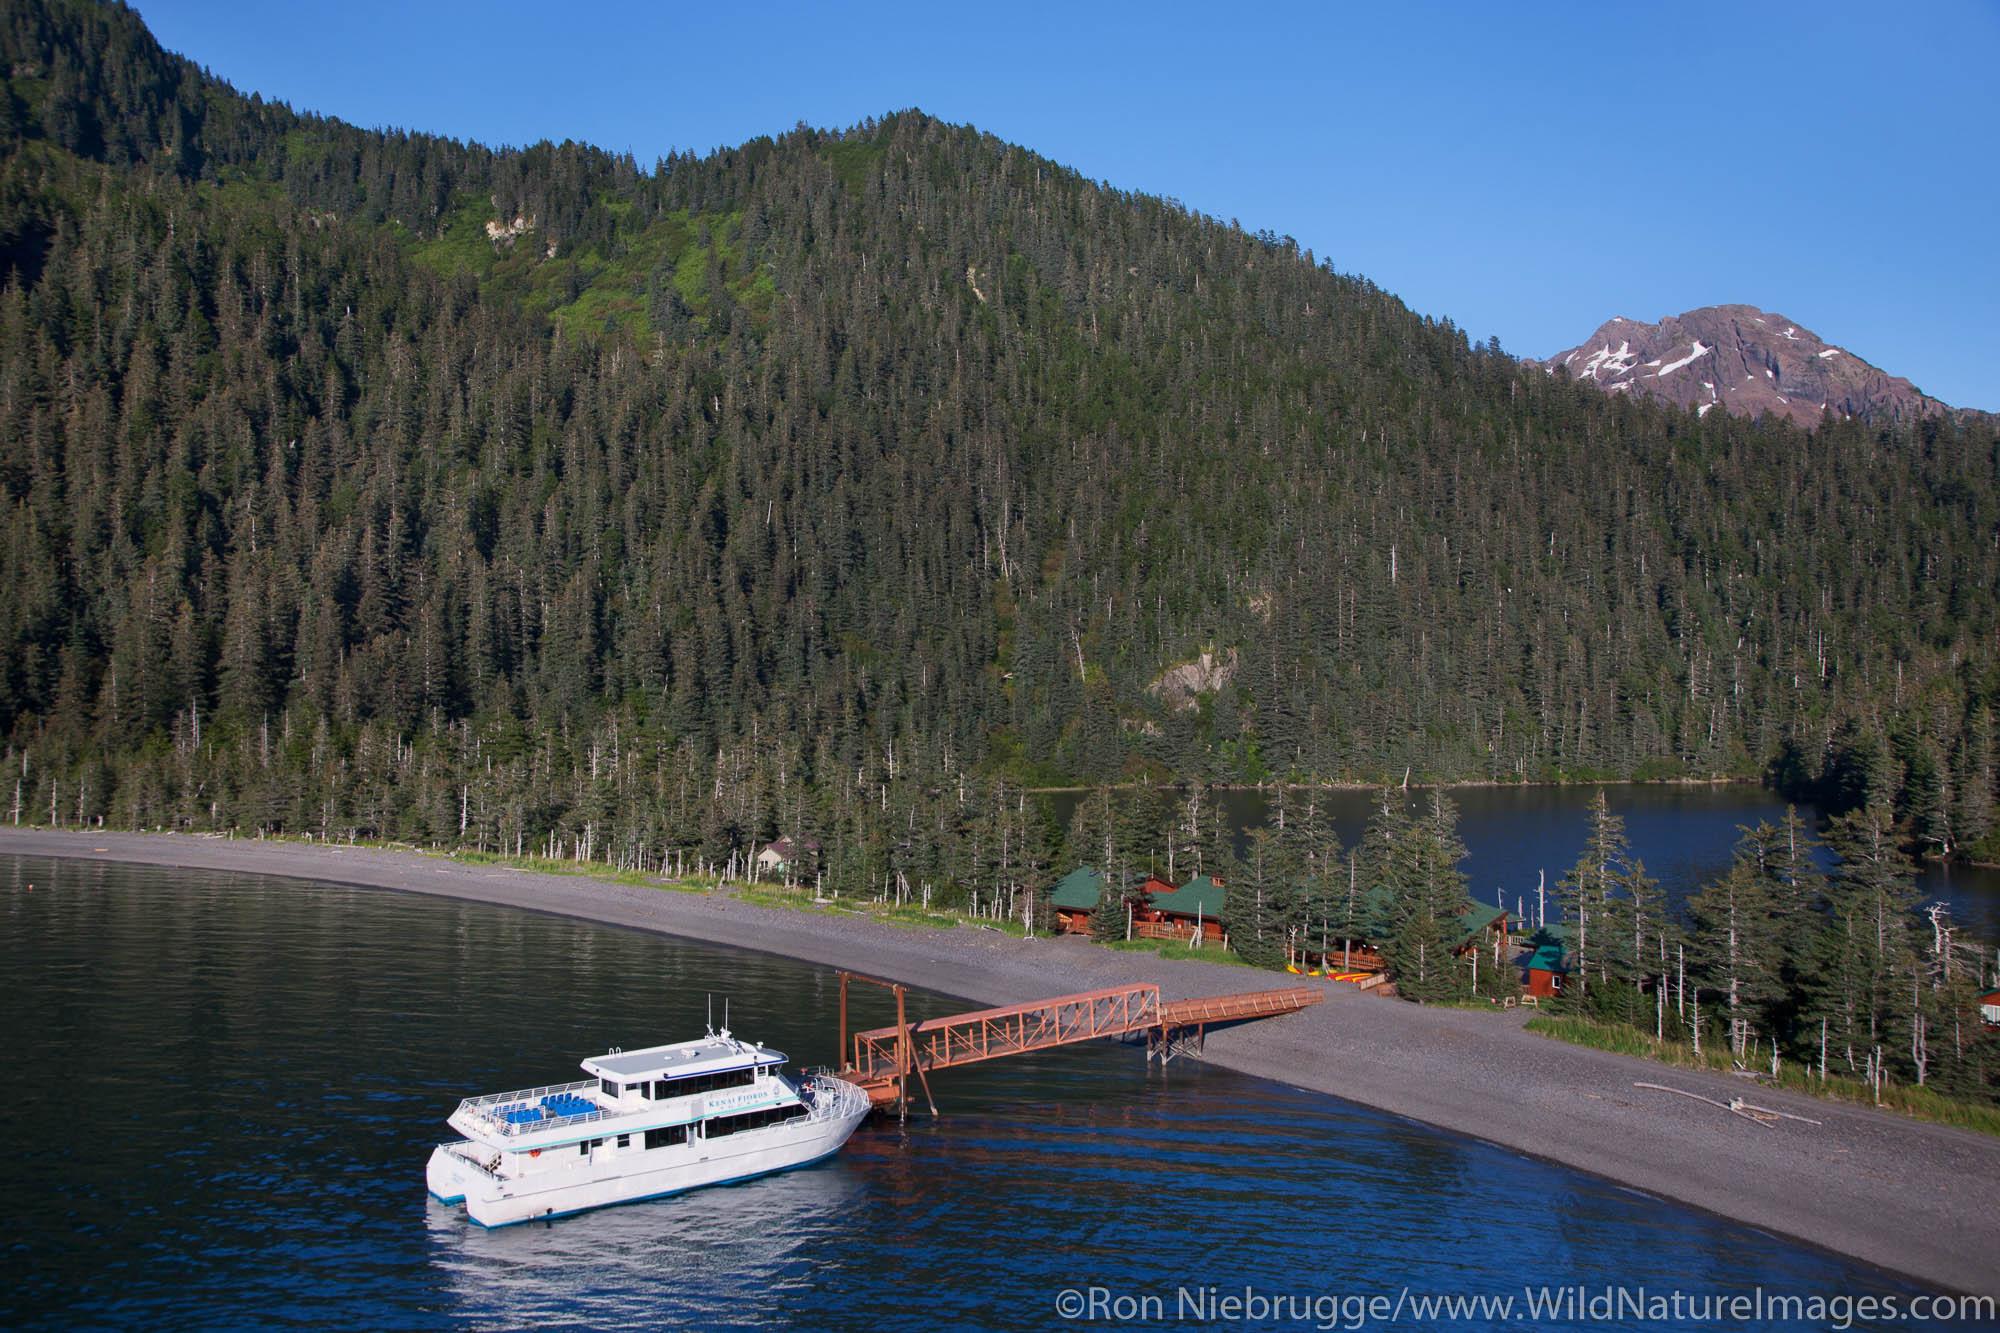 Aerial photo shoot for Kenai Fjords Tours 8-19-2010, near Seward, Alaska.